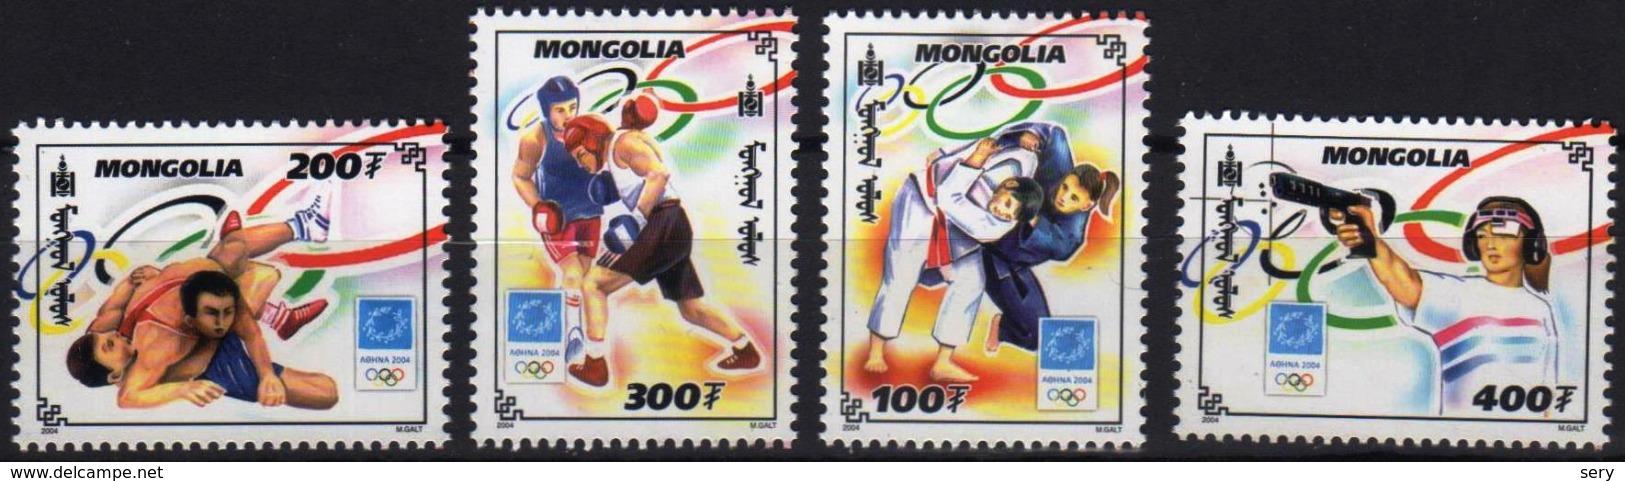 Mongolia 2004 Set 4 V MNH Olympic Games Wrestling Boxing Gun Shooting - Estate 2004: Atene